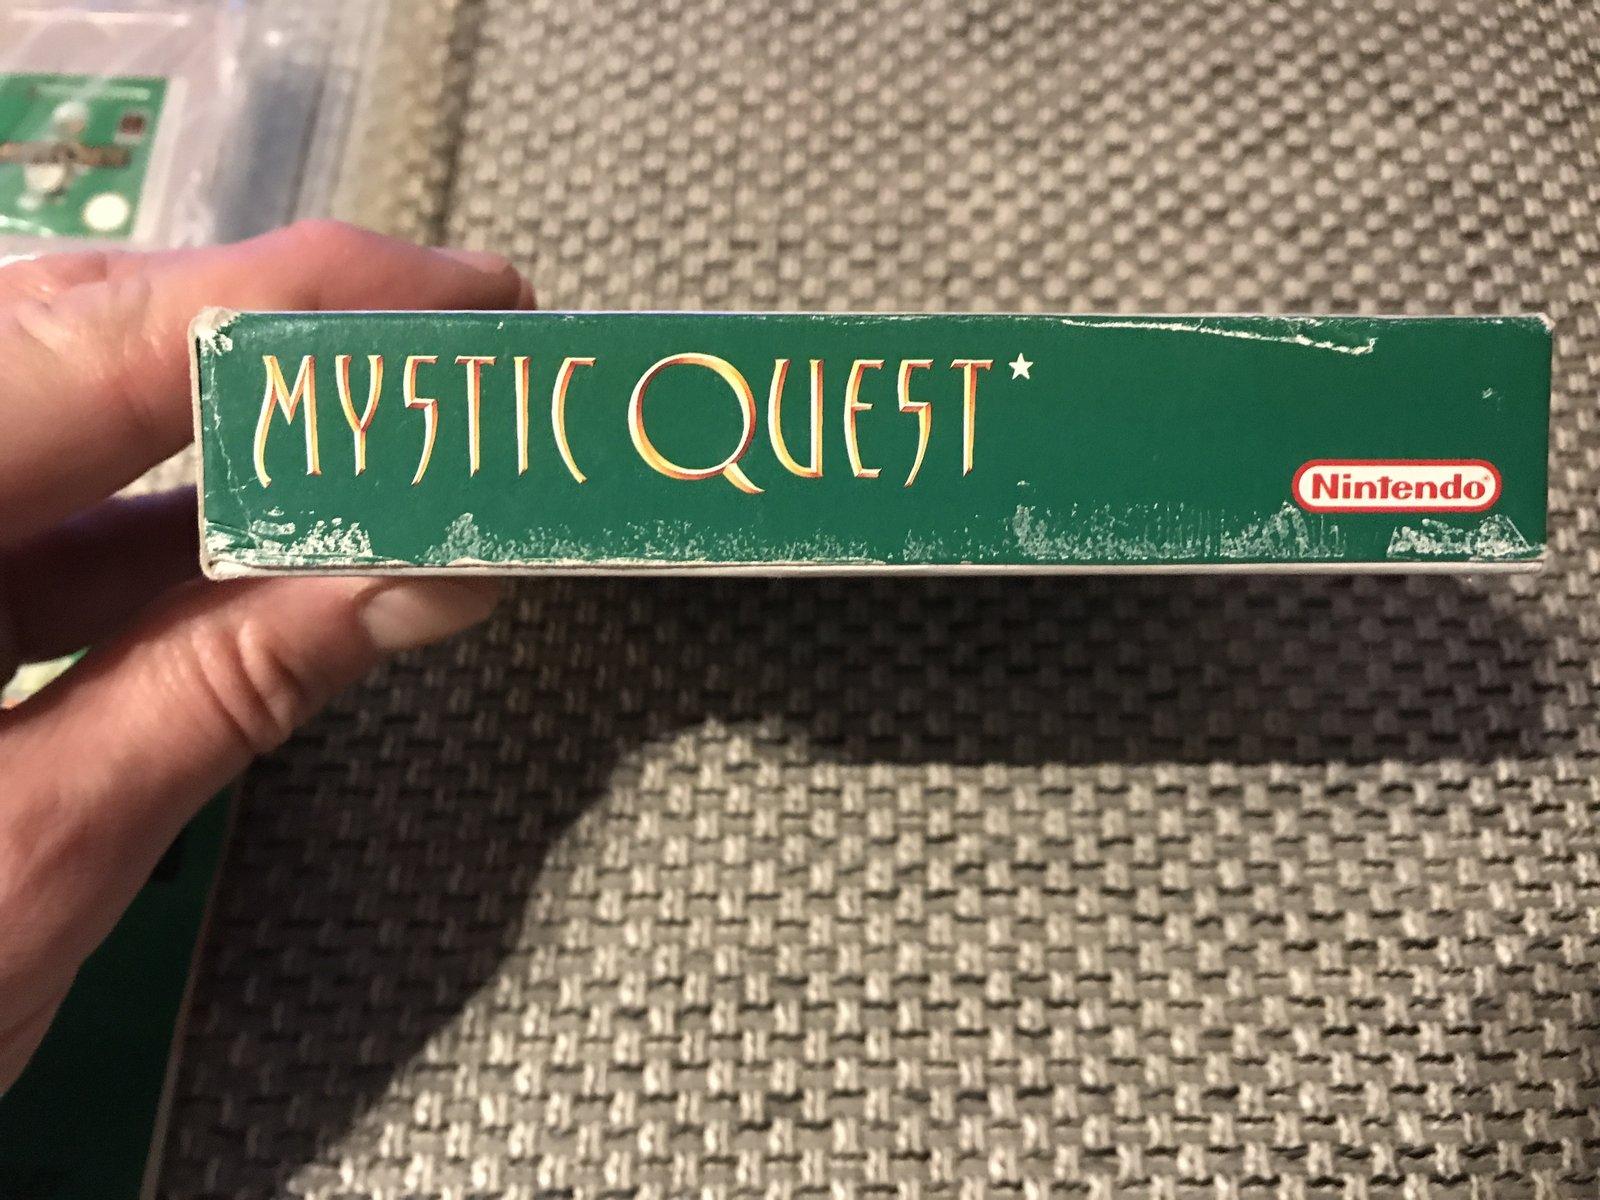 (VDS) Mystic Quest Game Boy + Kirby Dreamland 1 Game Boy 210105094651539065